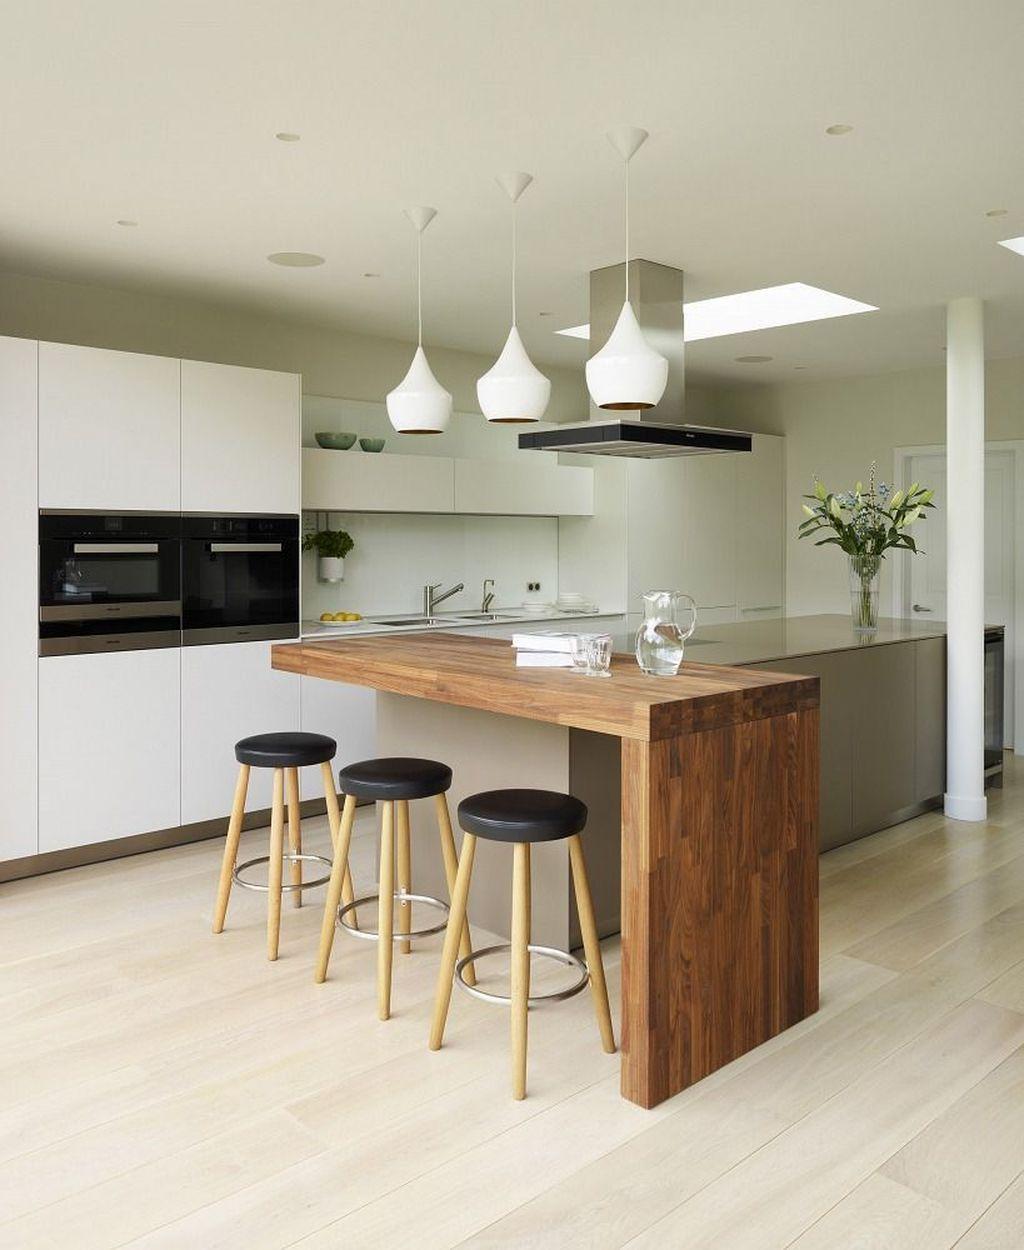 28 Small Kitchen Design Ideas: 38 Impressive Kitchen Island Design Ideas You Have To Know